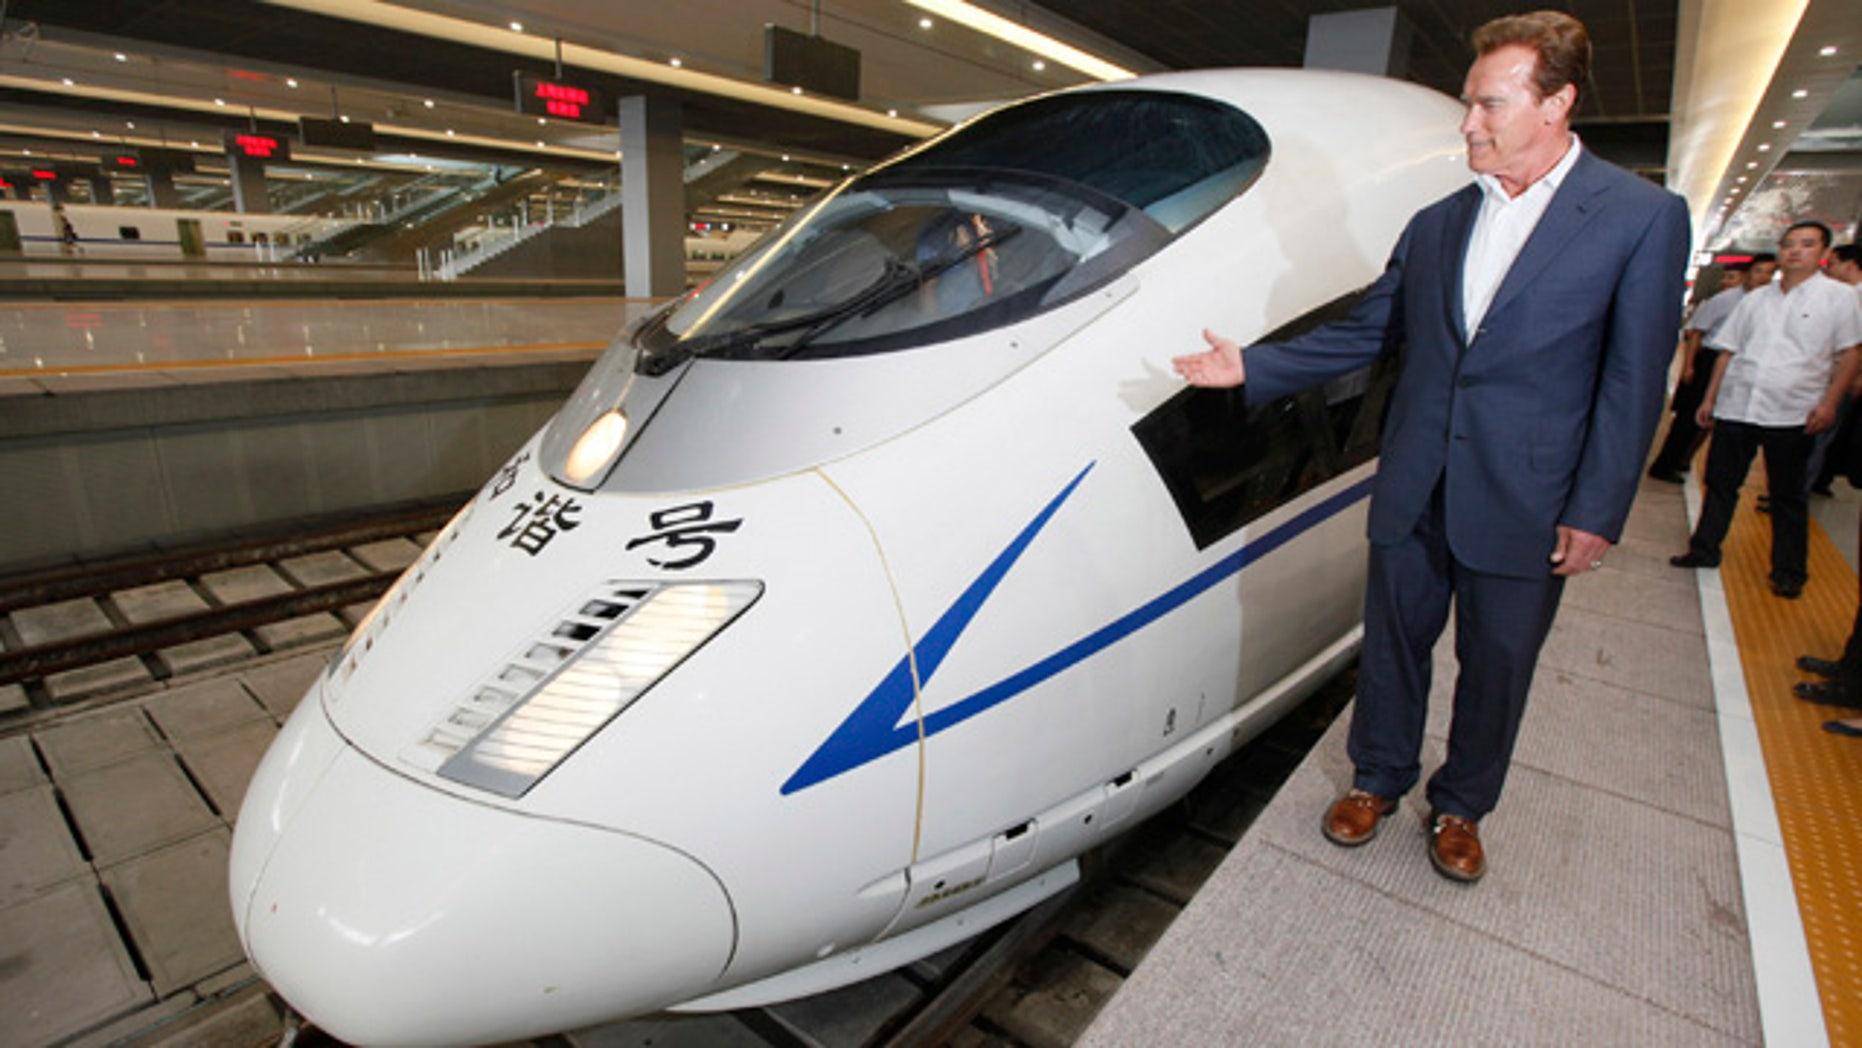 California Gov. Arnold Schwarzenegger admires China's high-speed train at Hongqiao Railway Station in Shanghai, China, Sunday, Sept. 12, 2010.